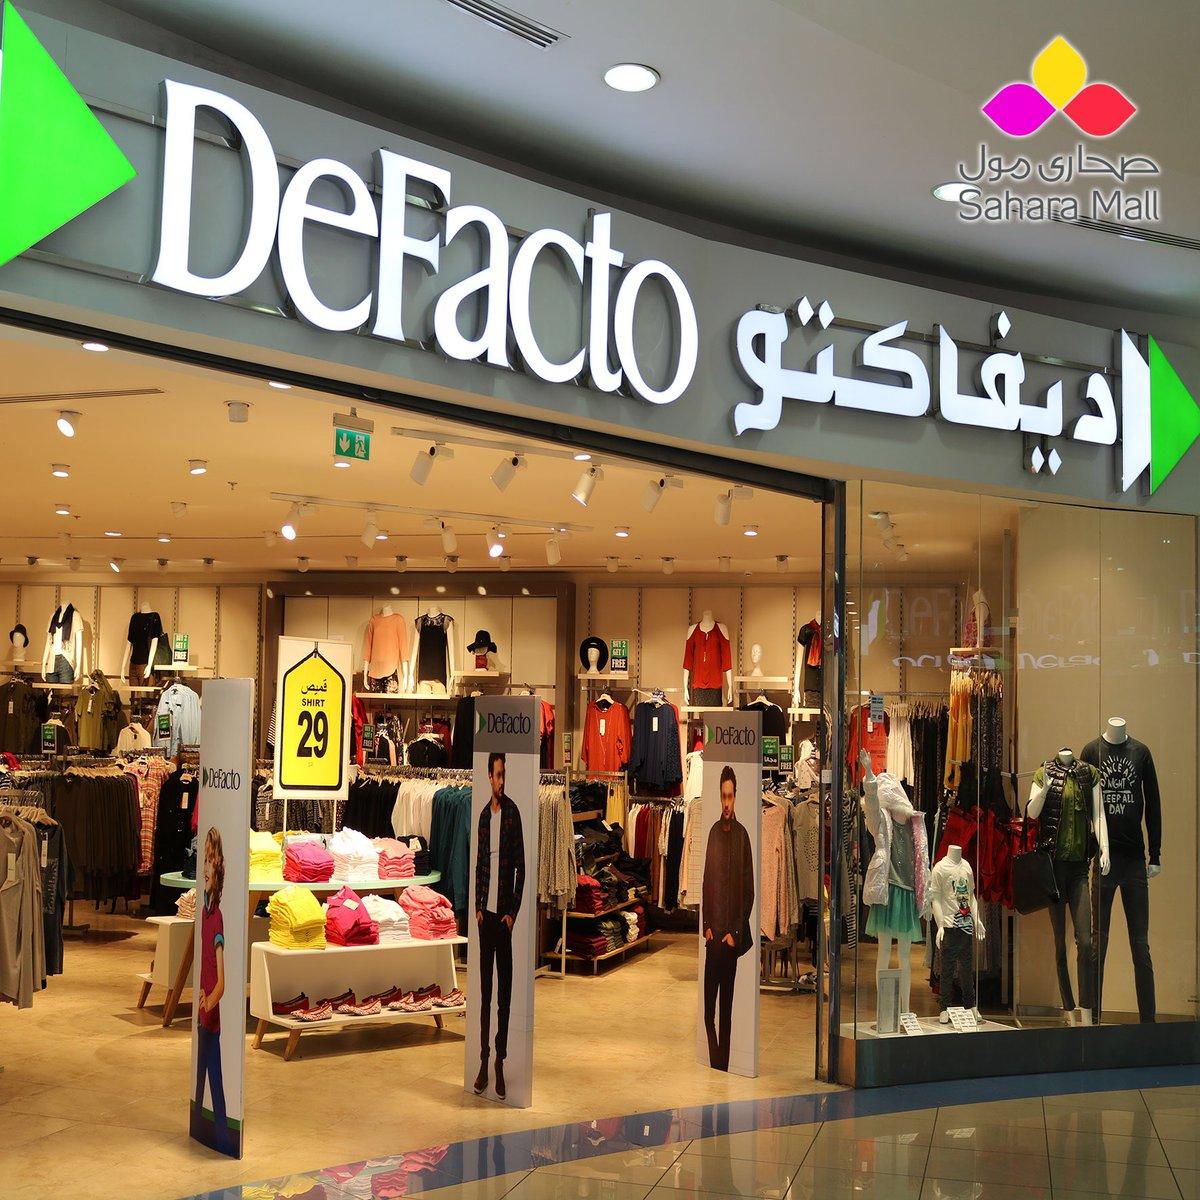 "Sahara Mall صـ ـحـ ـا ر ى مول الرياض on Twitter: ""ديفاكتو صحارى مول 👗👒👛  #صحارى_مول #مولات_الرياض #فعليات_الرياض… """